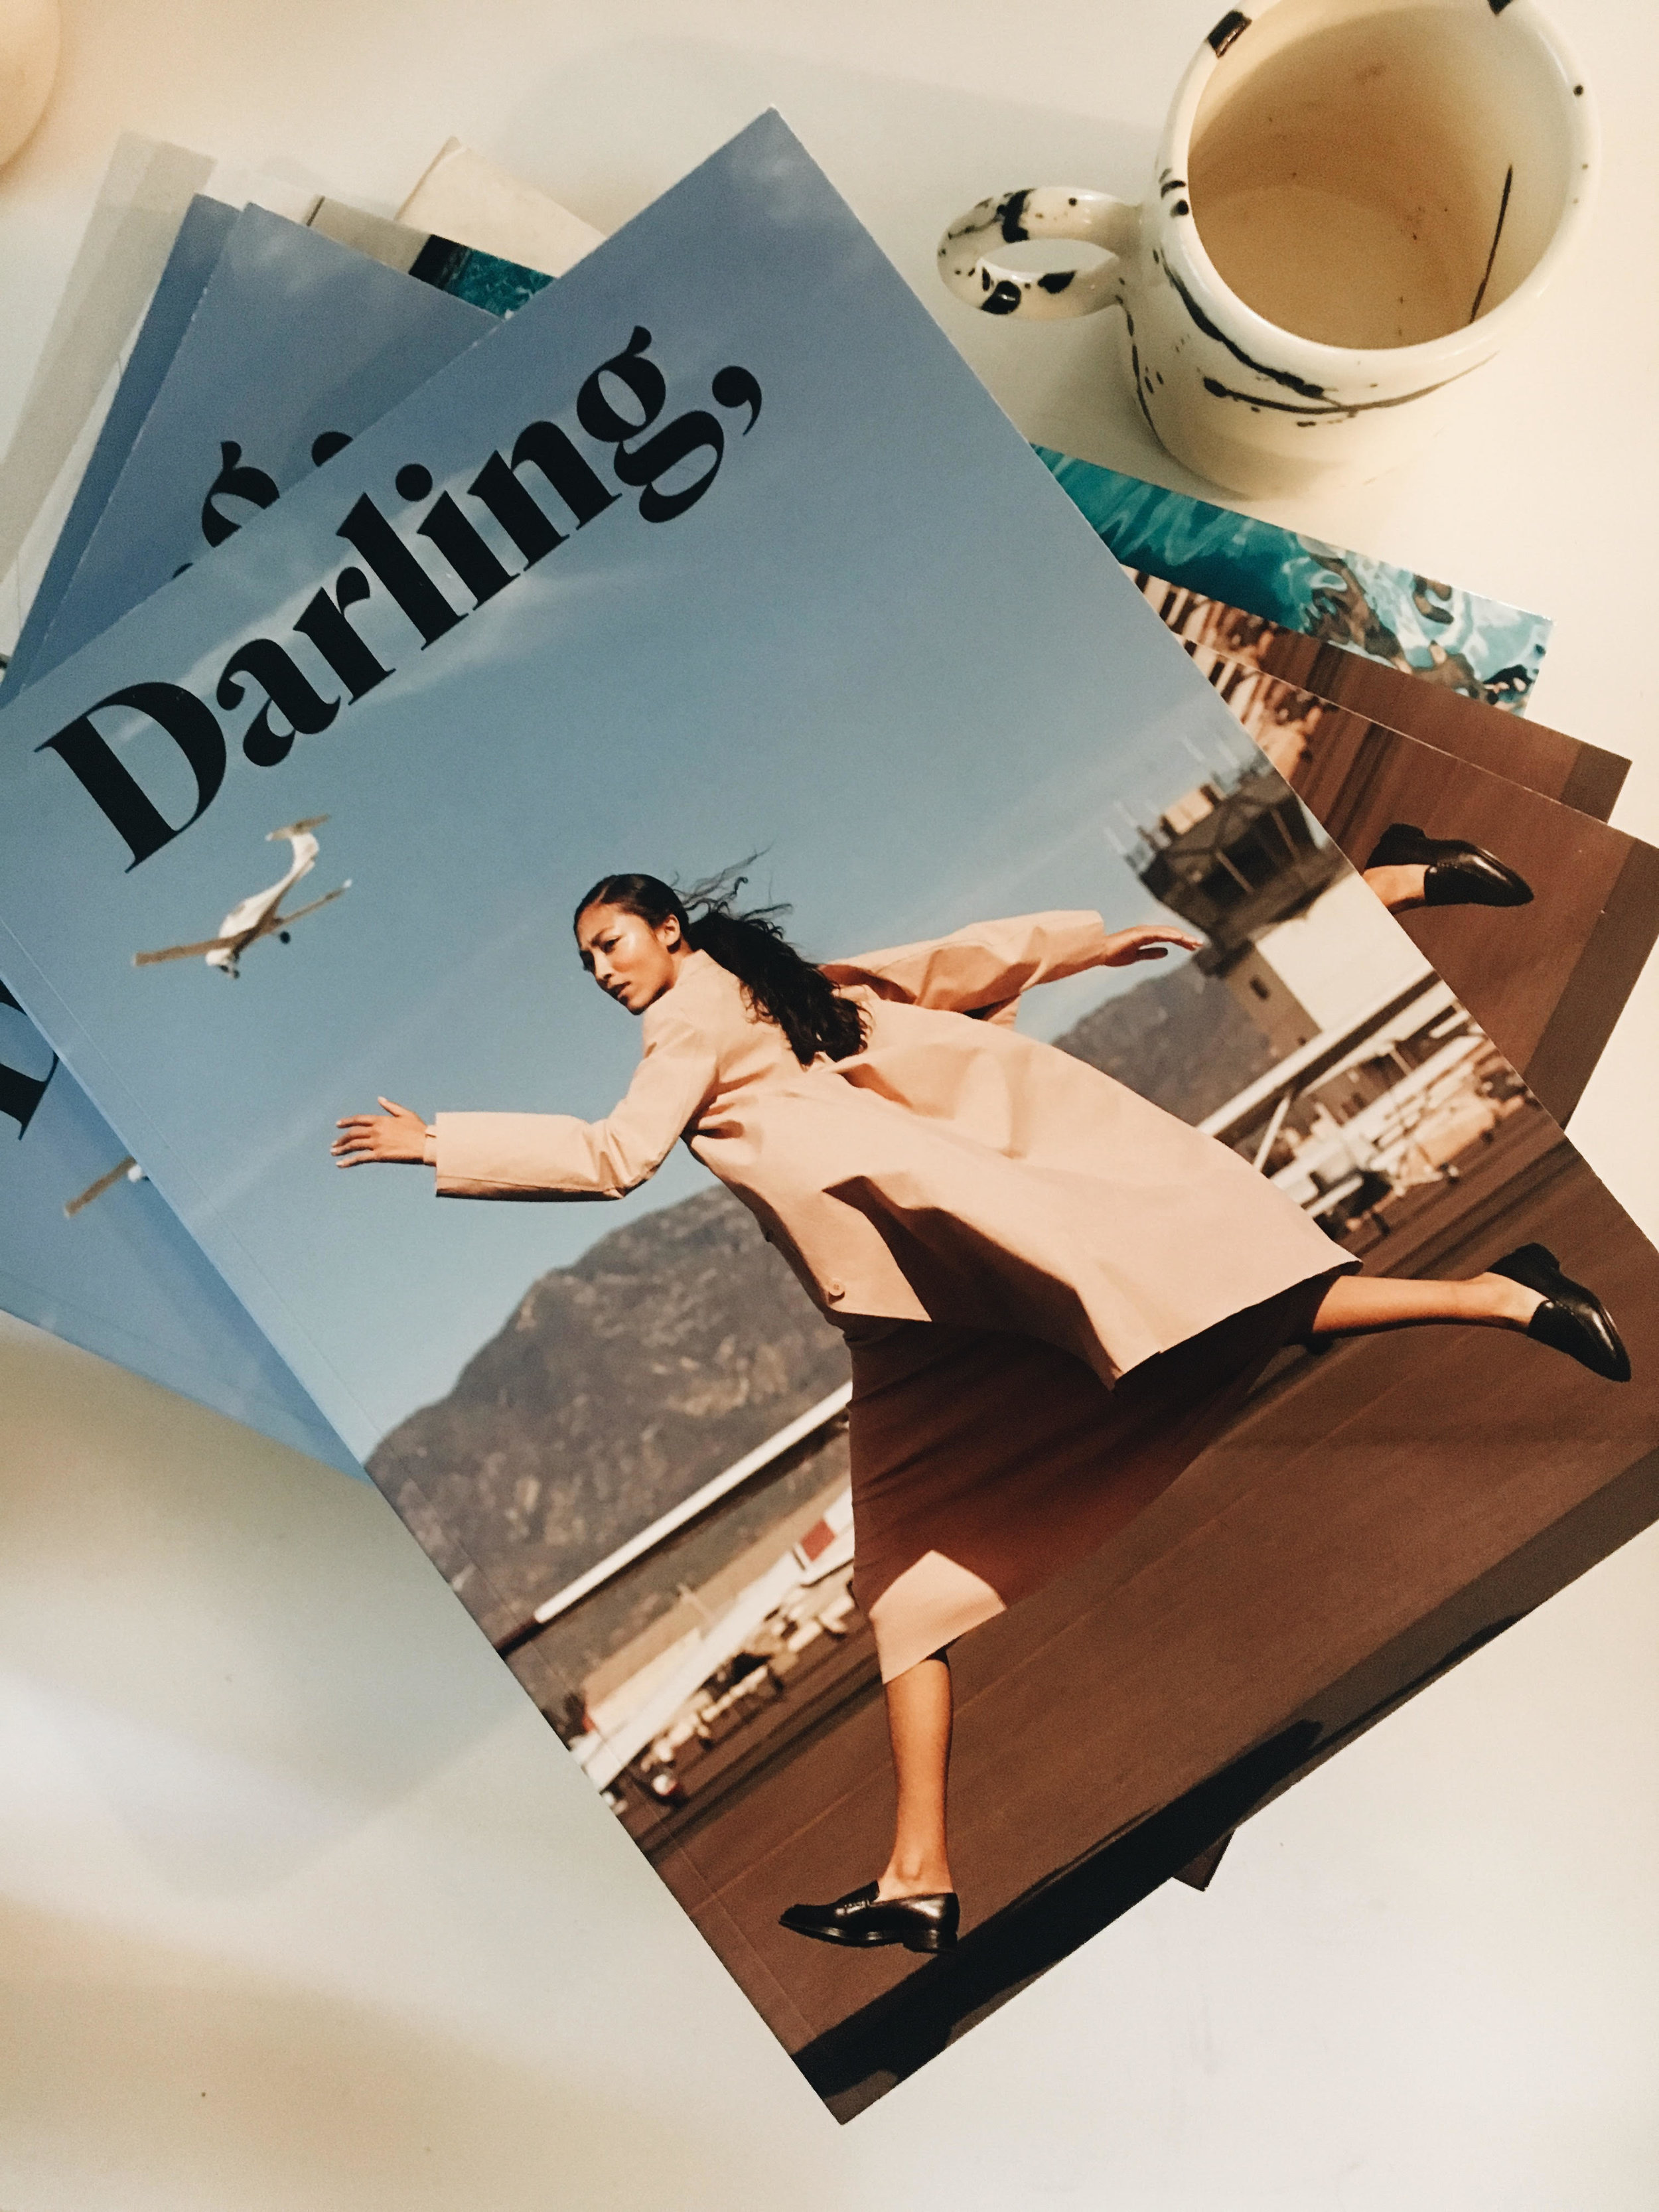 DarlingMagazine_LaLaLocal_Quilt.jpg